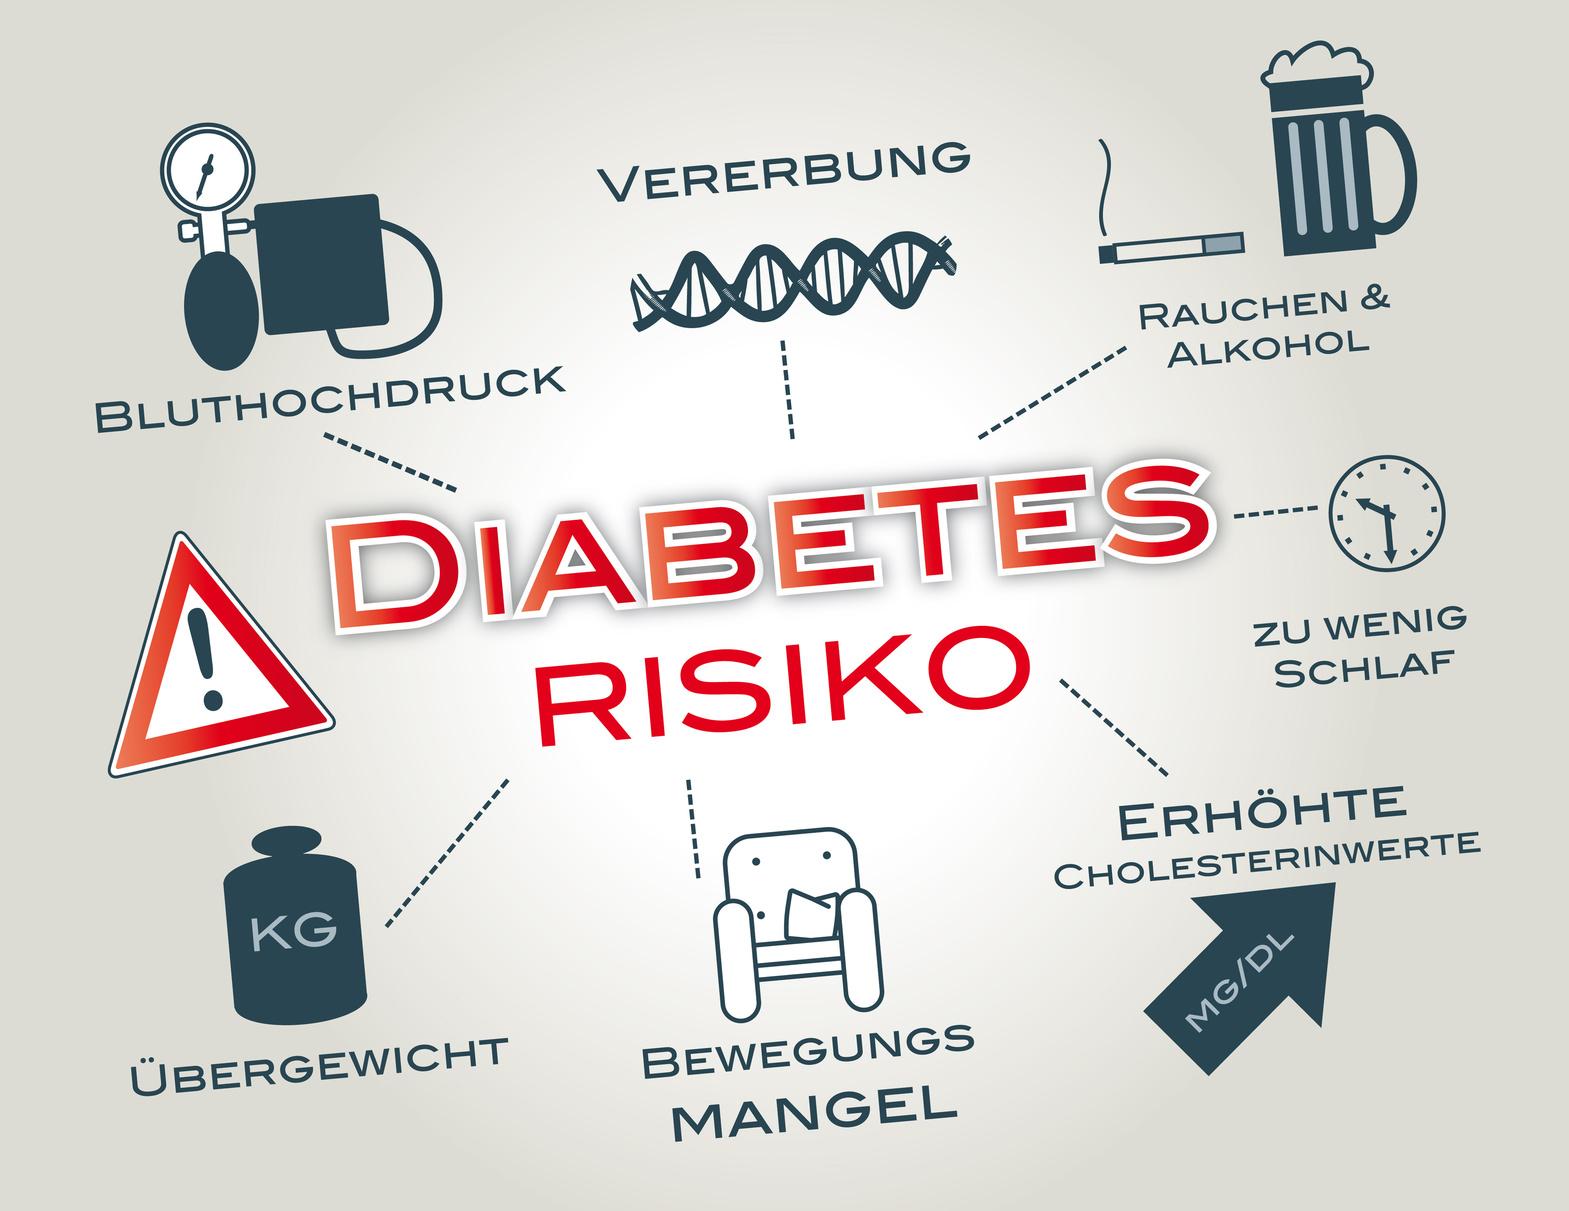 Diabetesrisiko, Diabetes, Zuckerkrank, Insulin, Dit, abnehmen